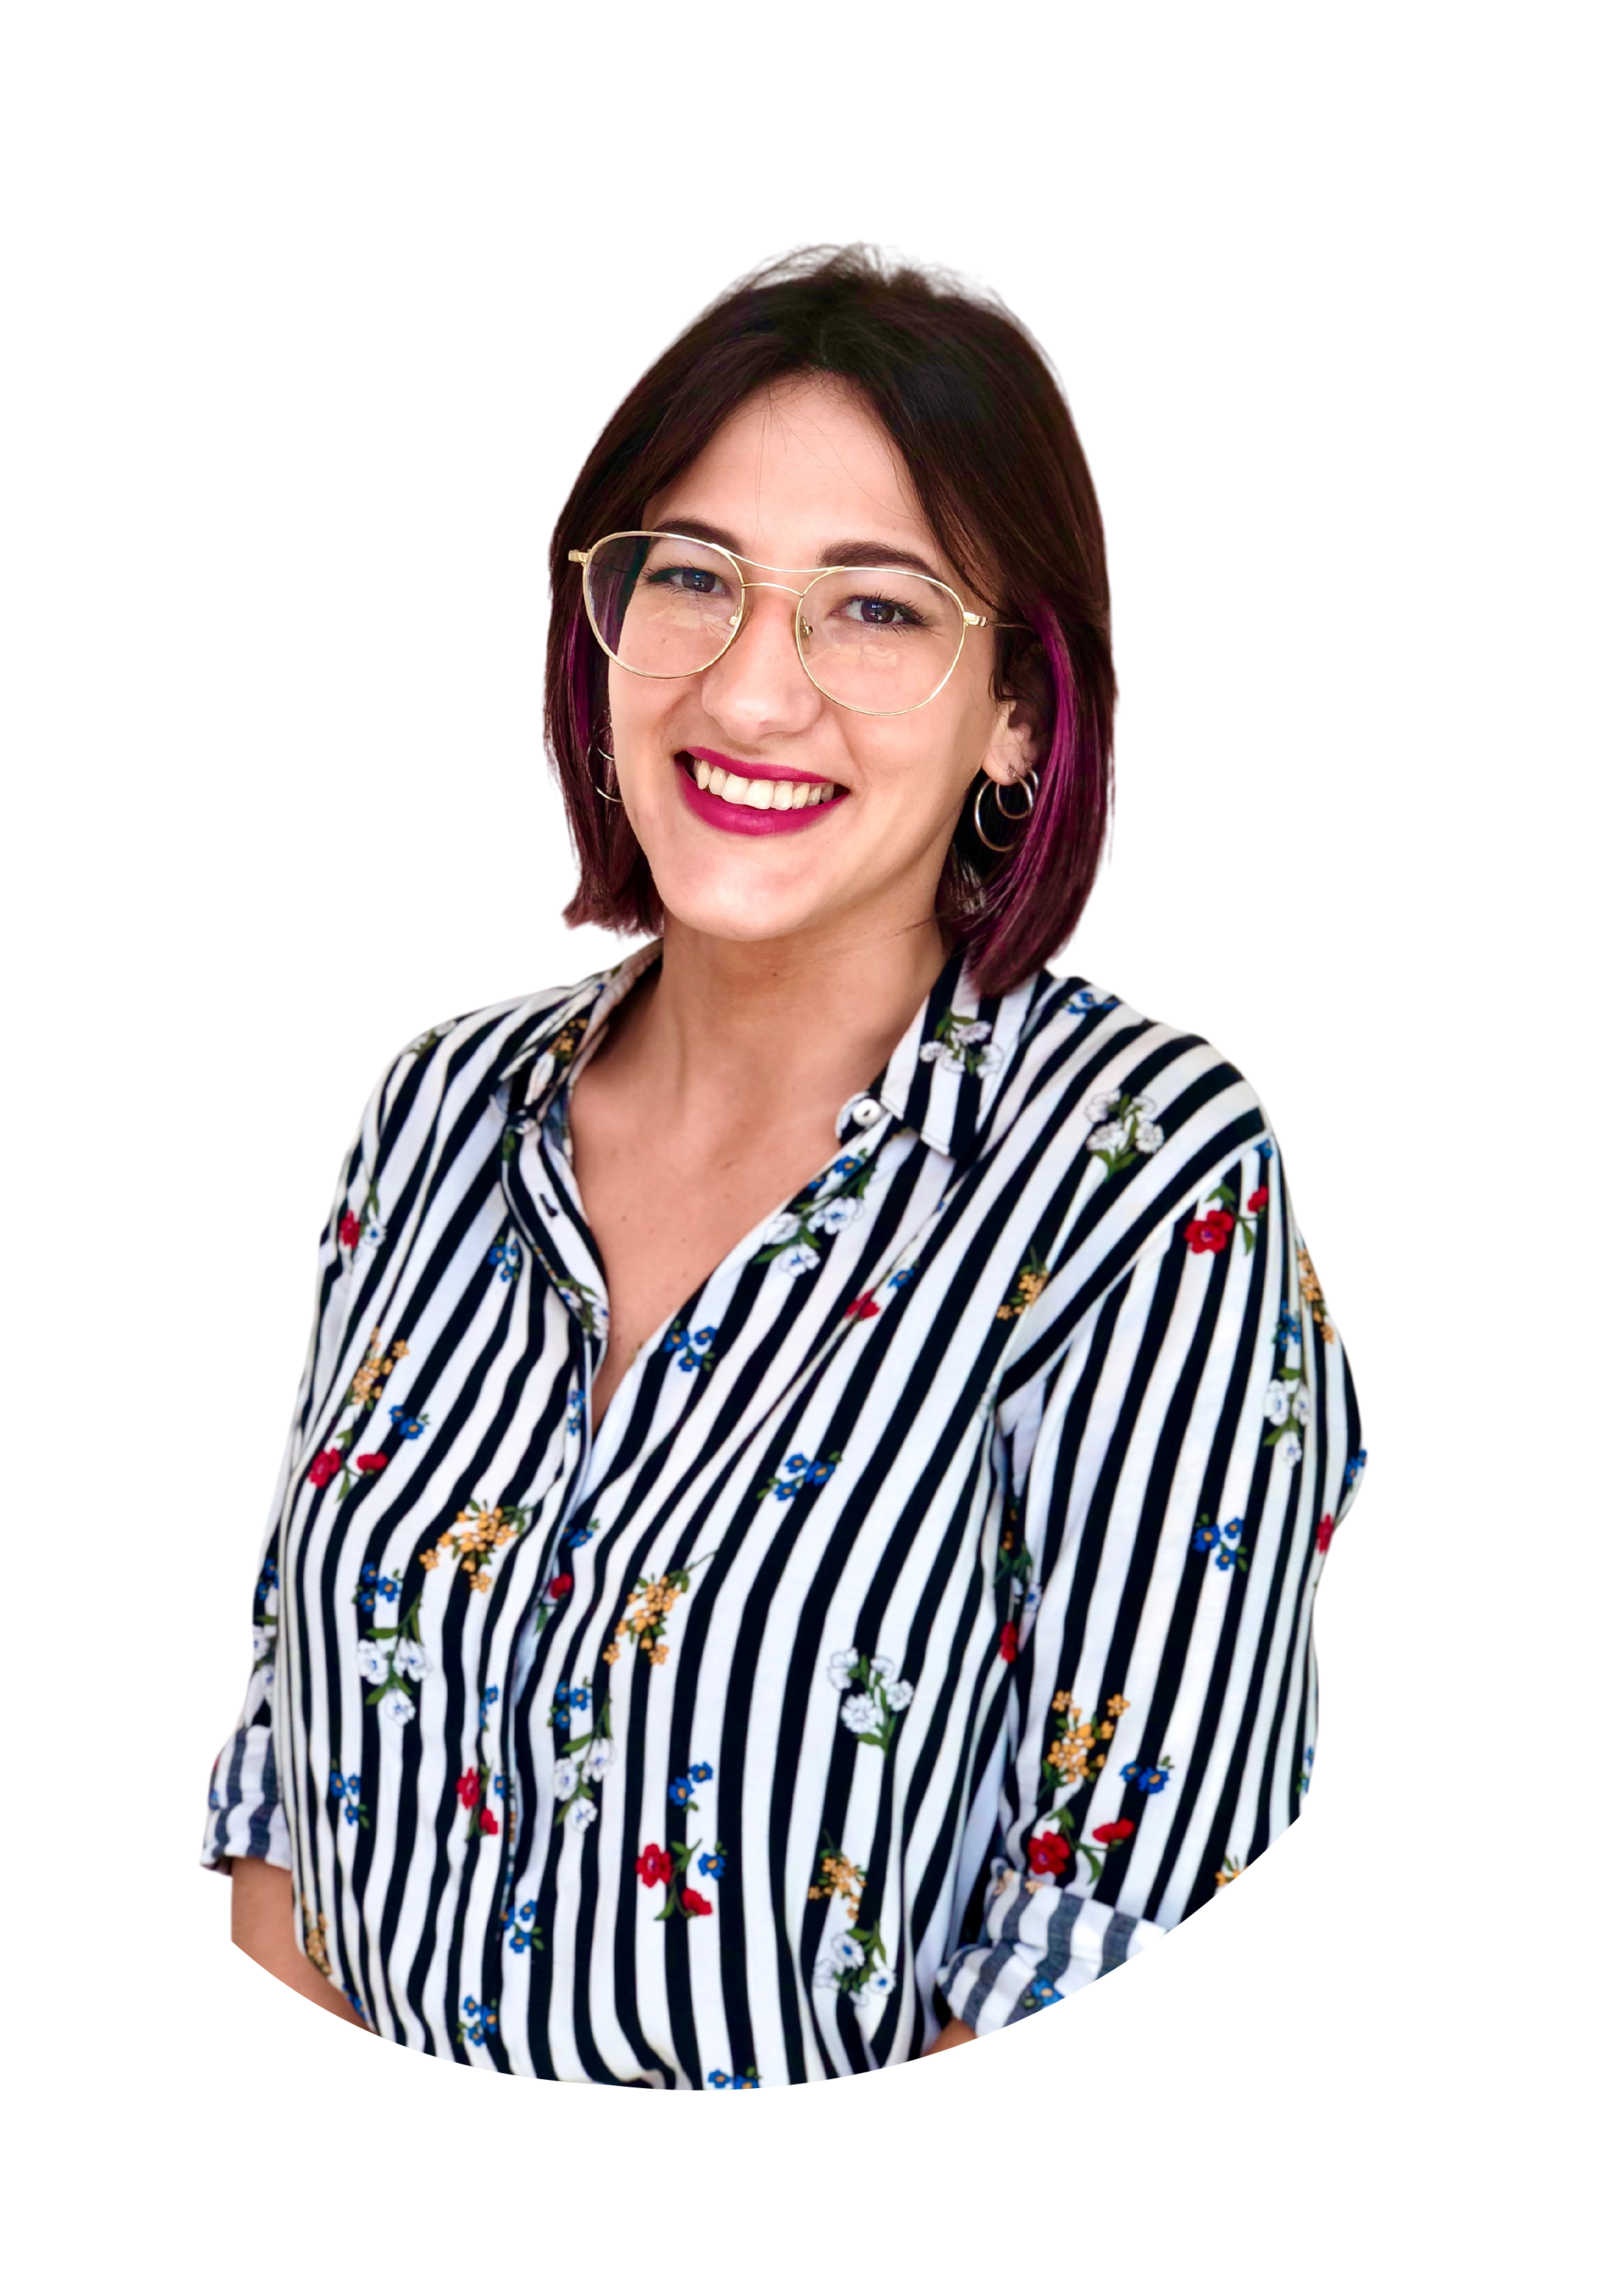 Claudia Bosi